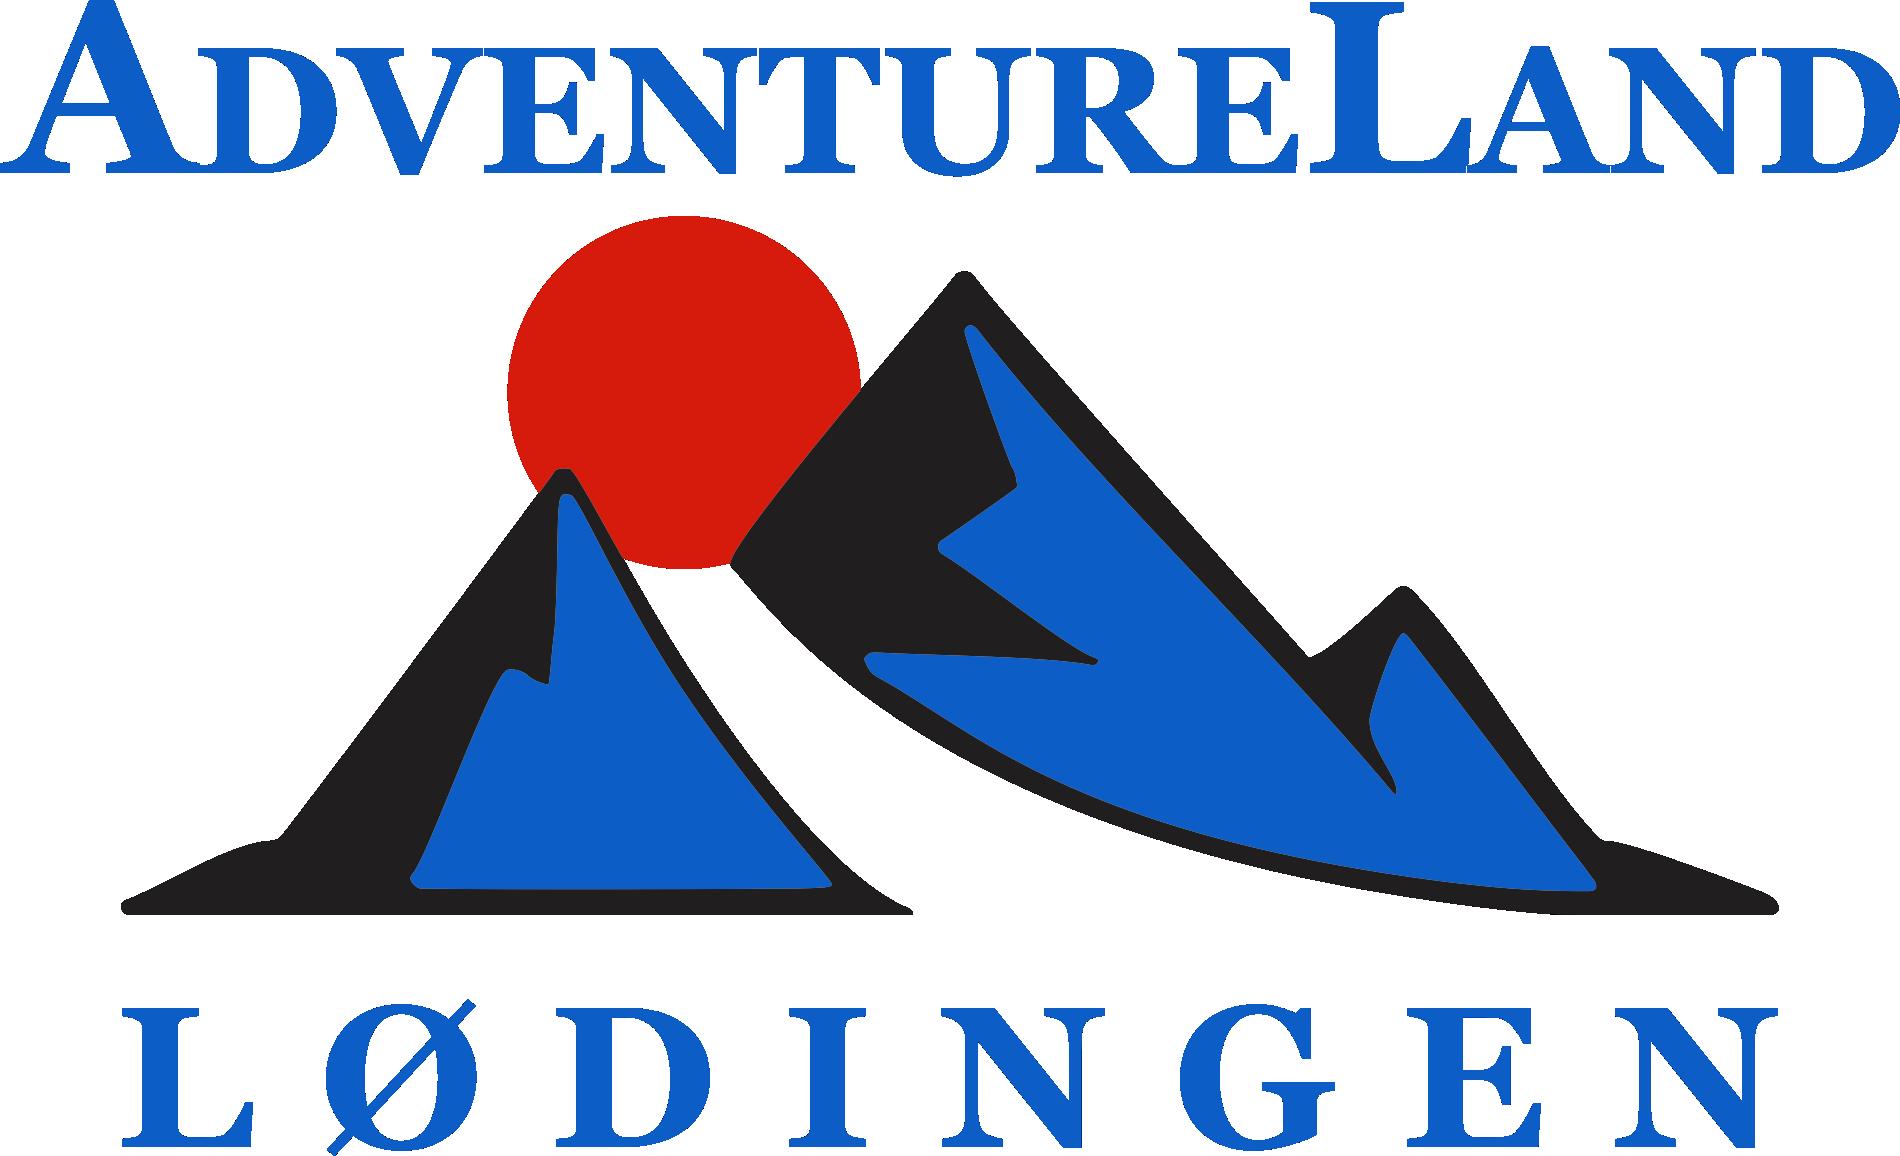 AdventureLand Lødingen